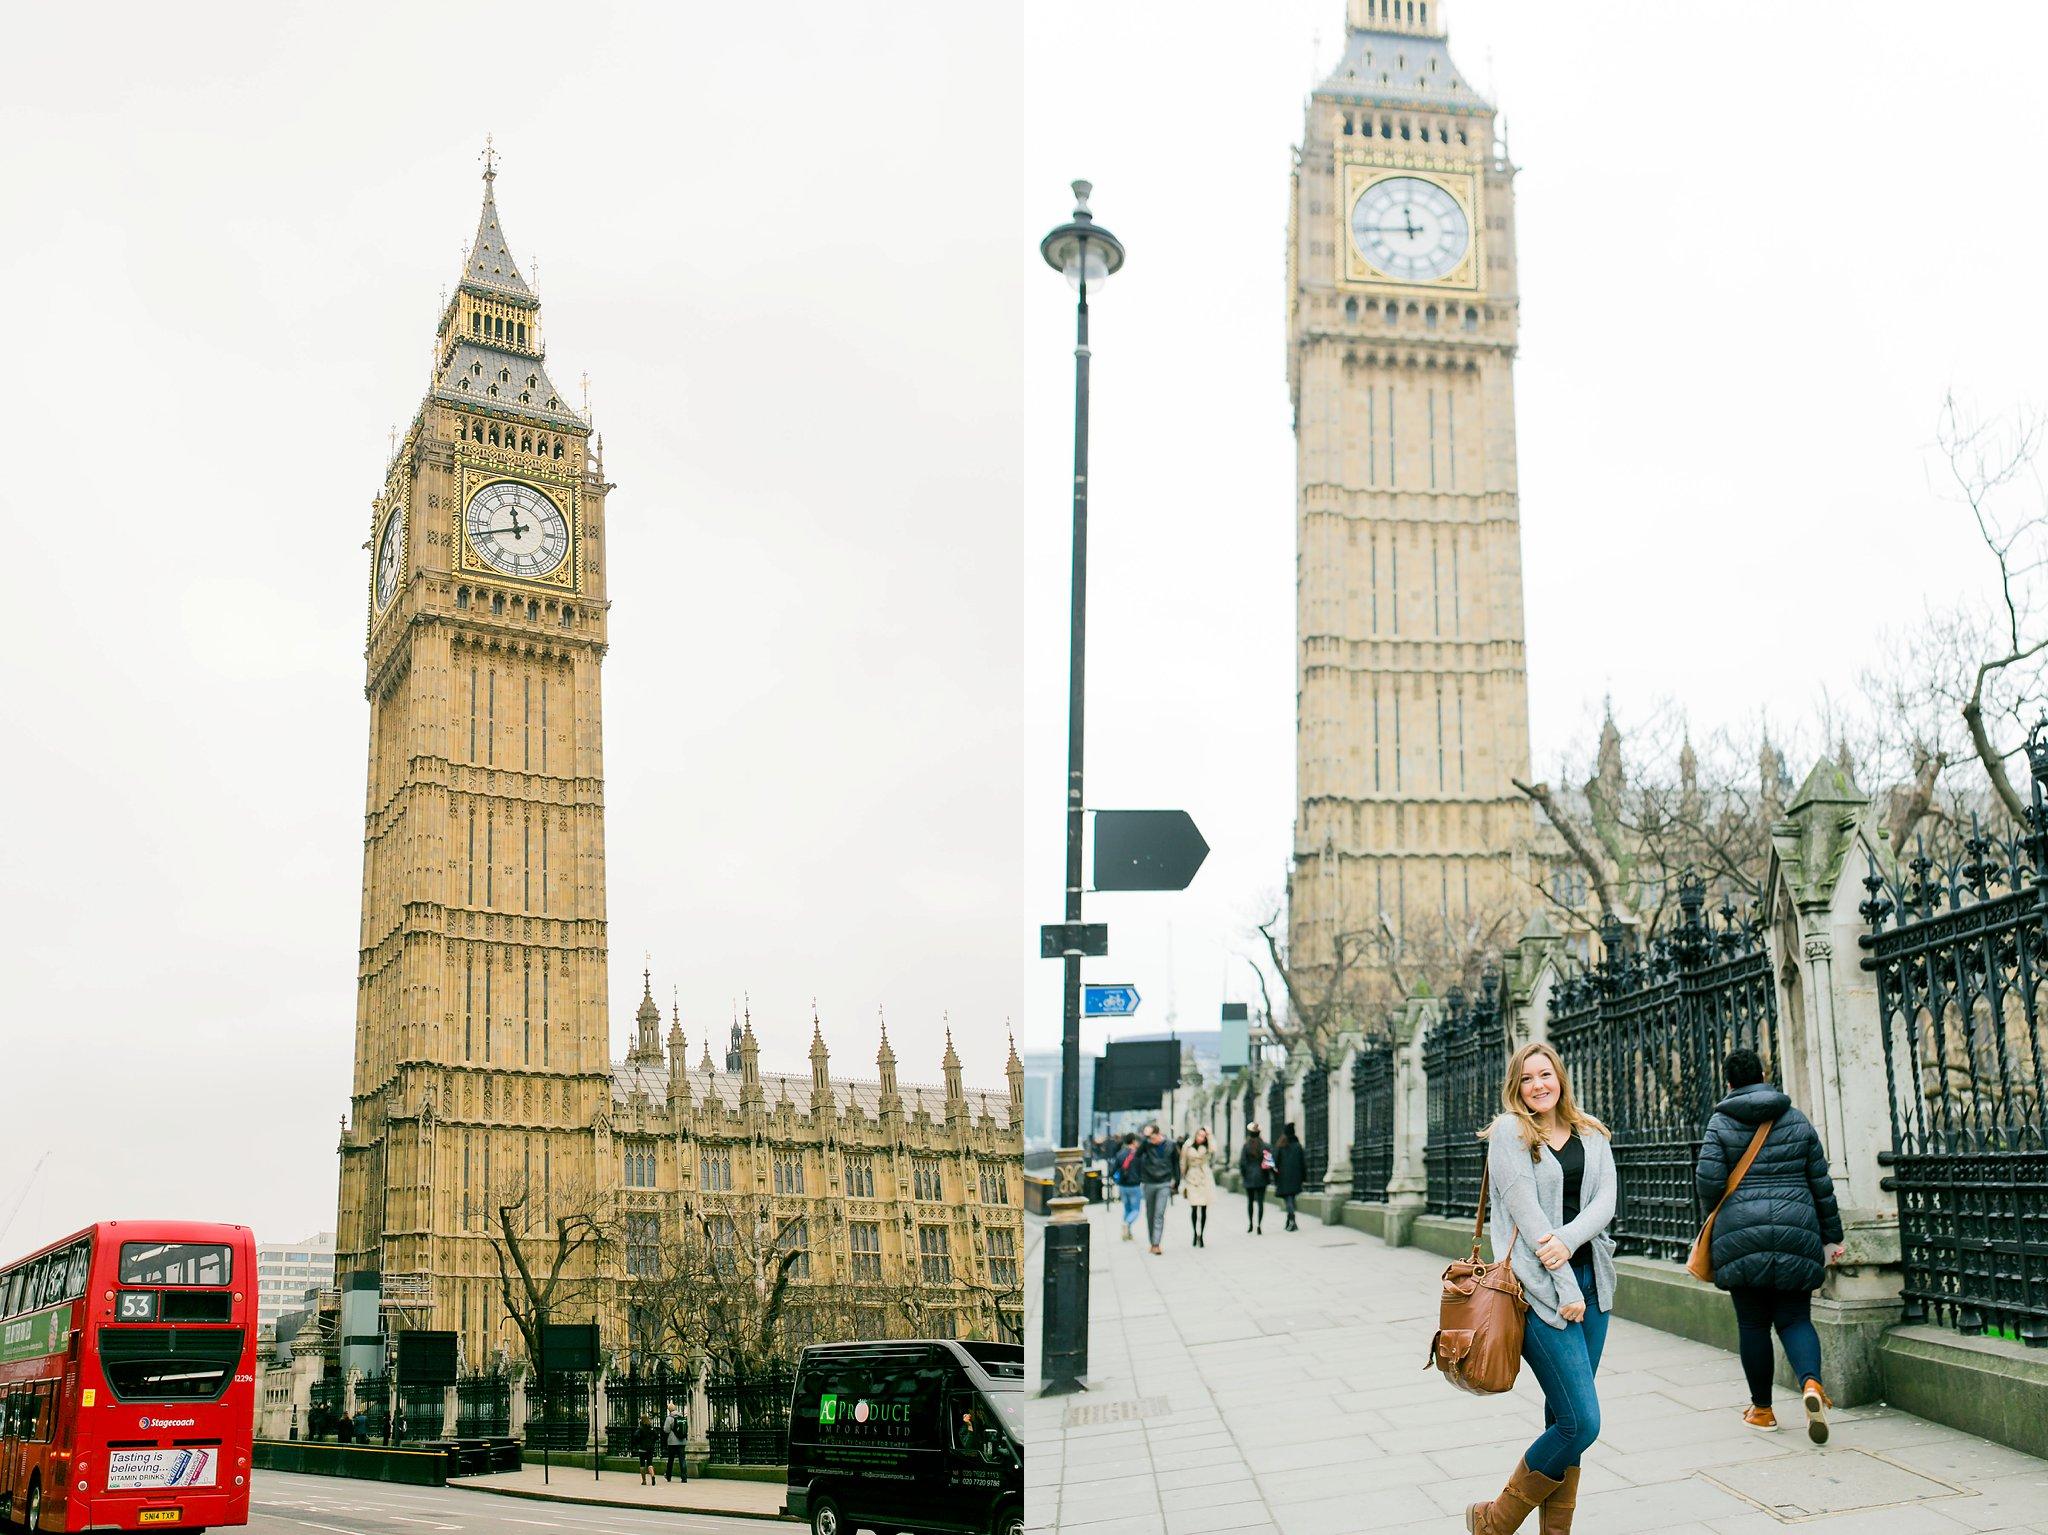 London Part II Westminster Abbey Tower Bridge Tower of London Big Ben-1772.jpg